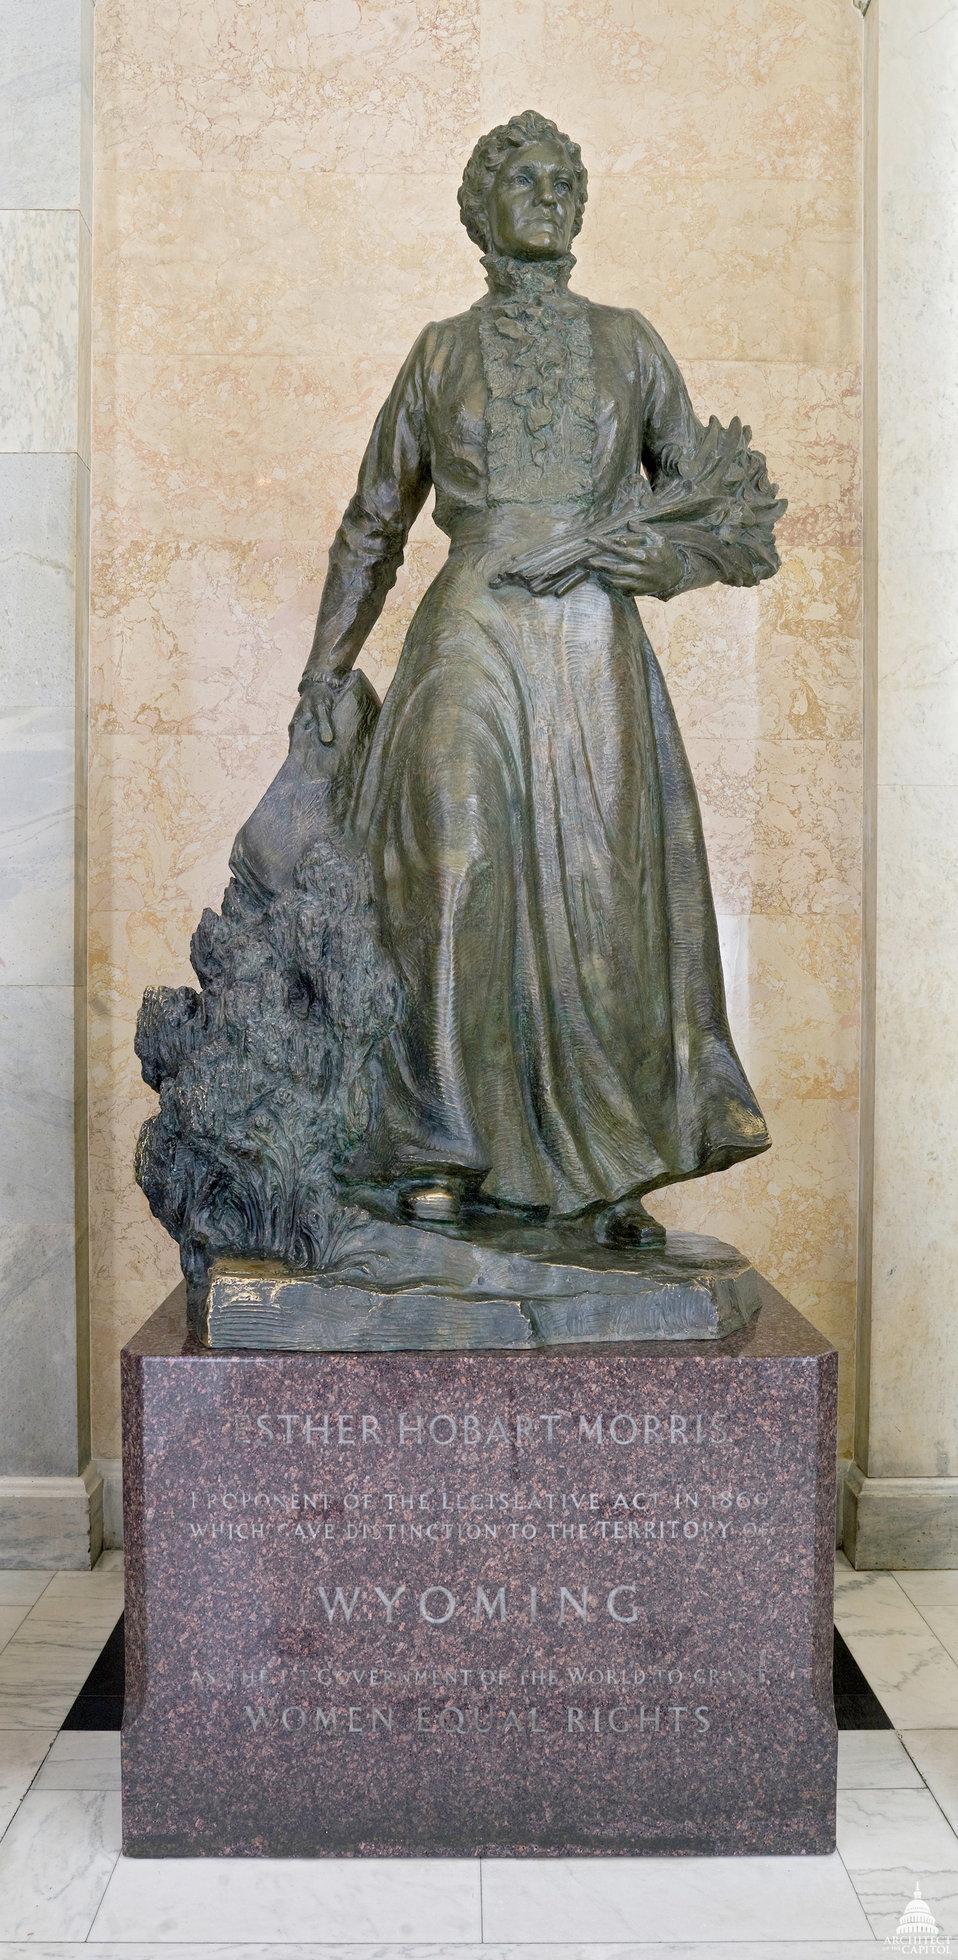 Esther Hobart Morris Statue